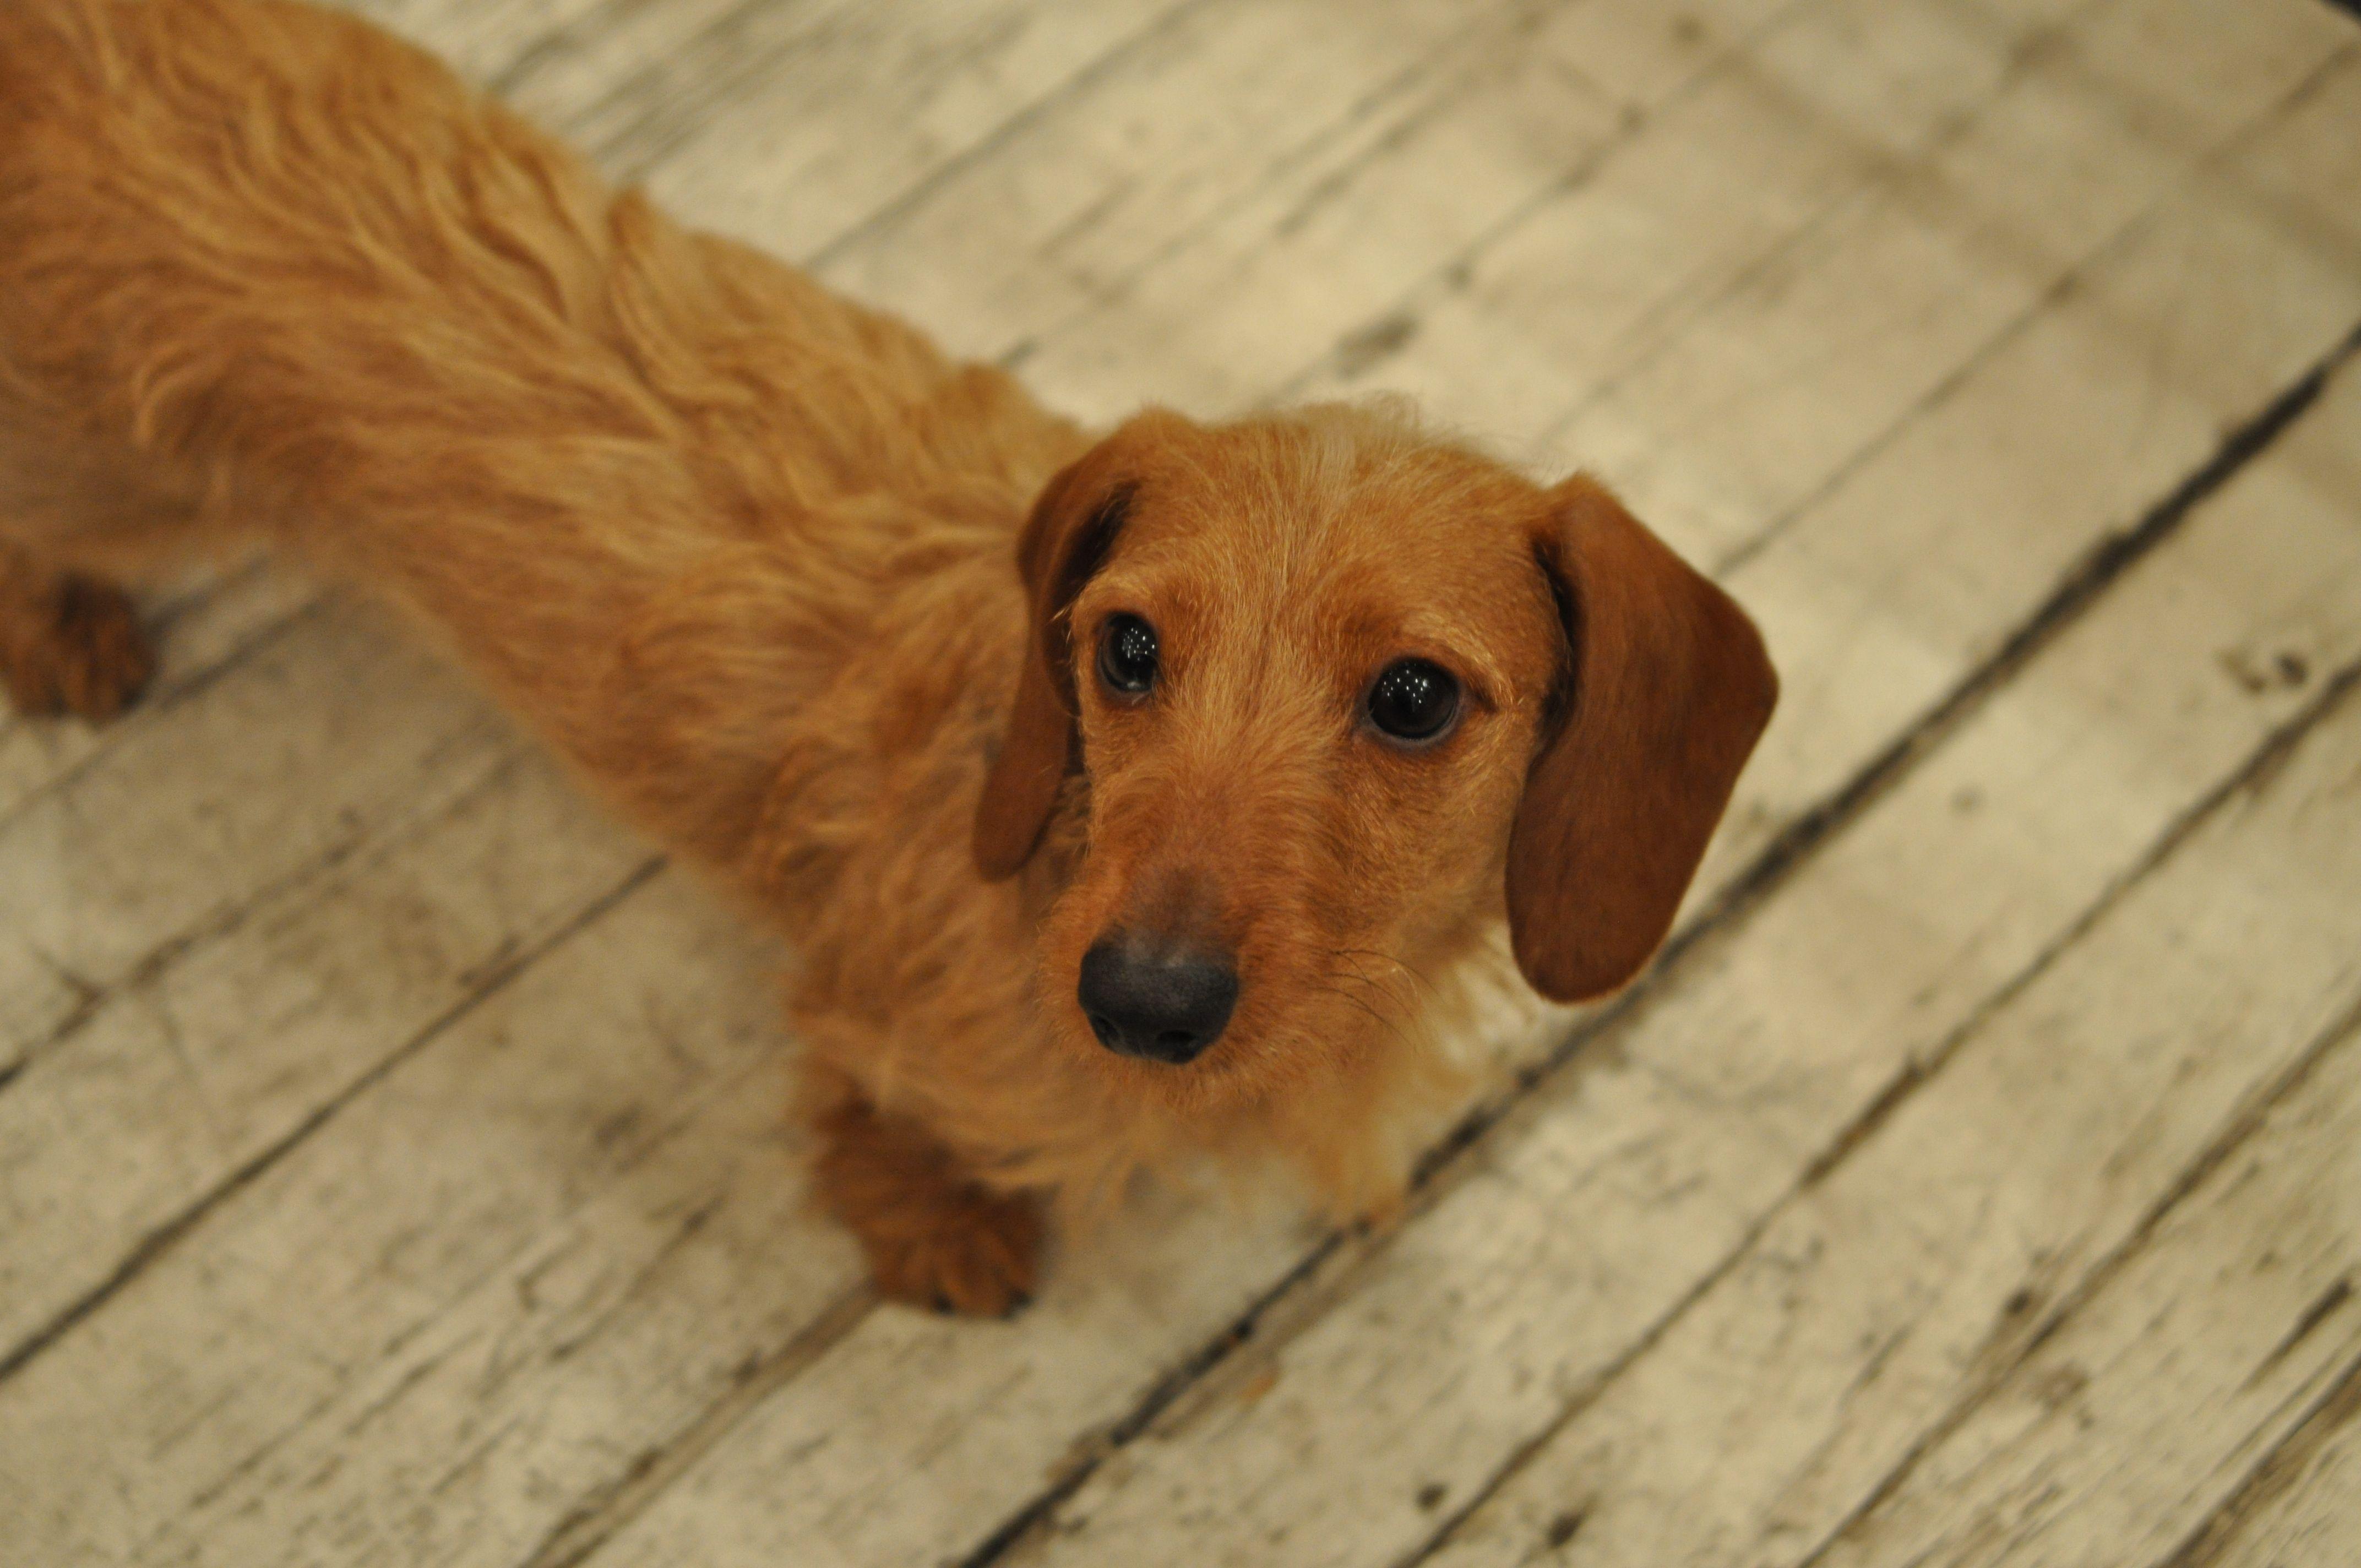 Mercedes! #dogsofmecox #doglover #dogs #petsofmecox #petlover #pets #dachshund